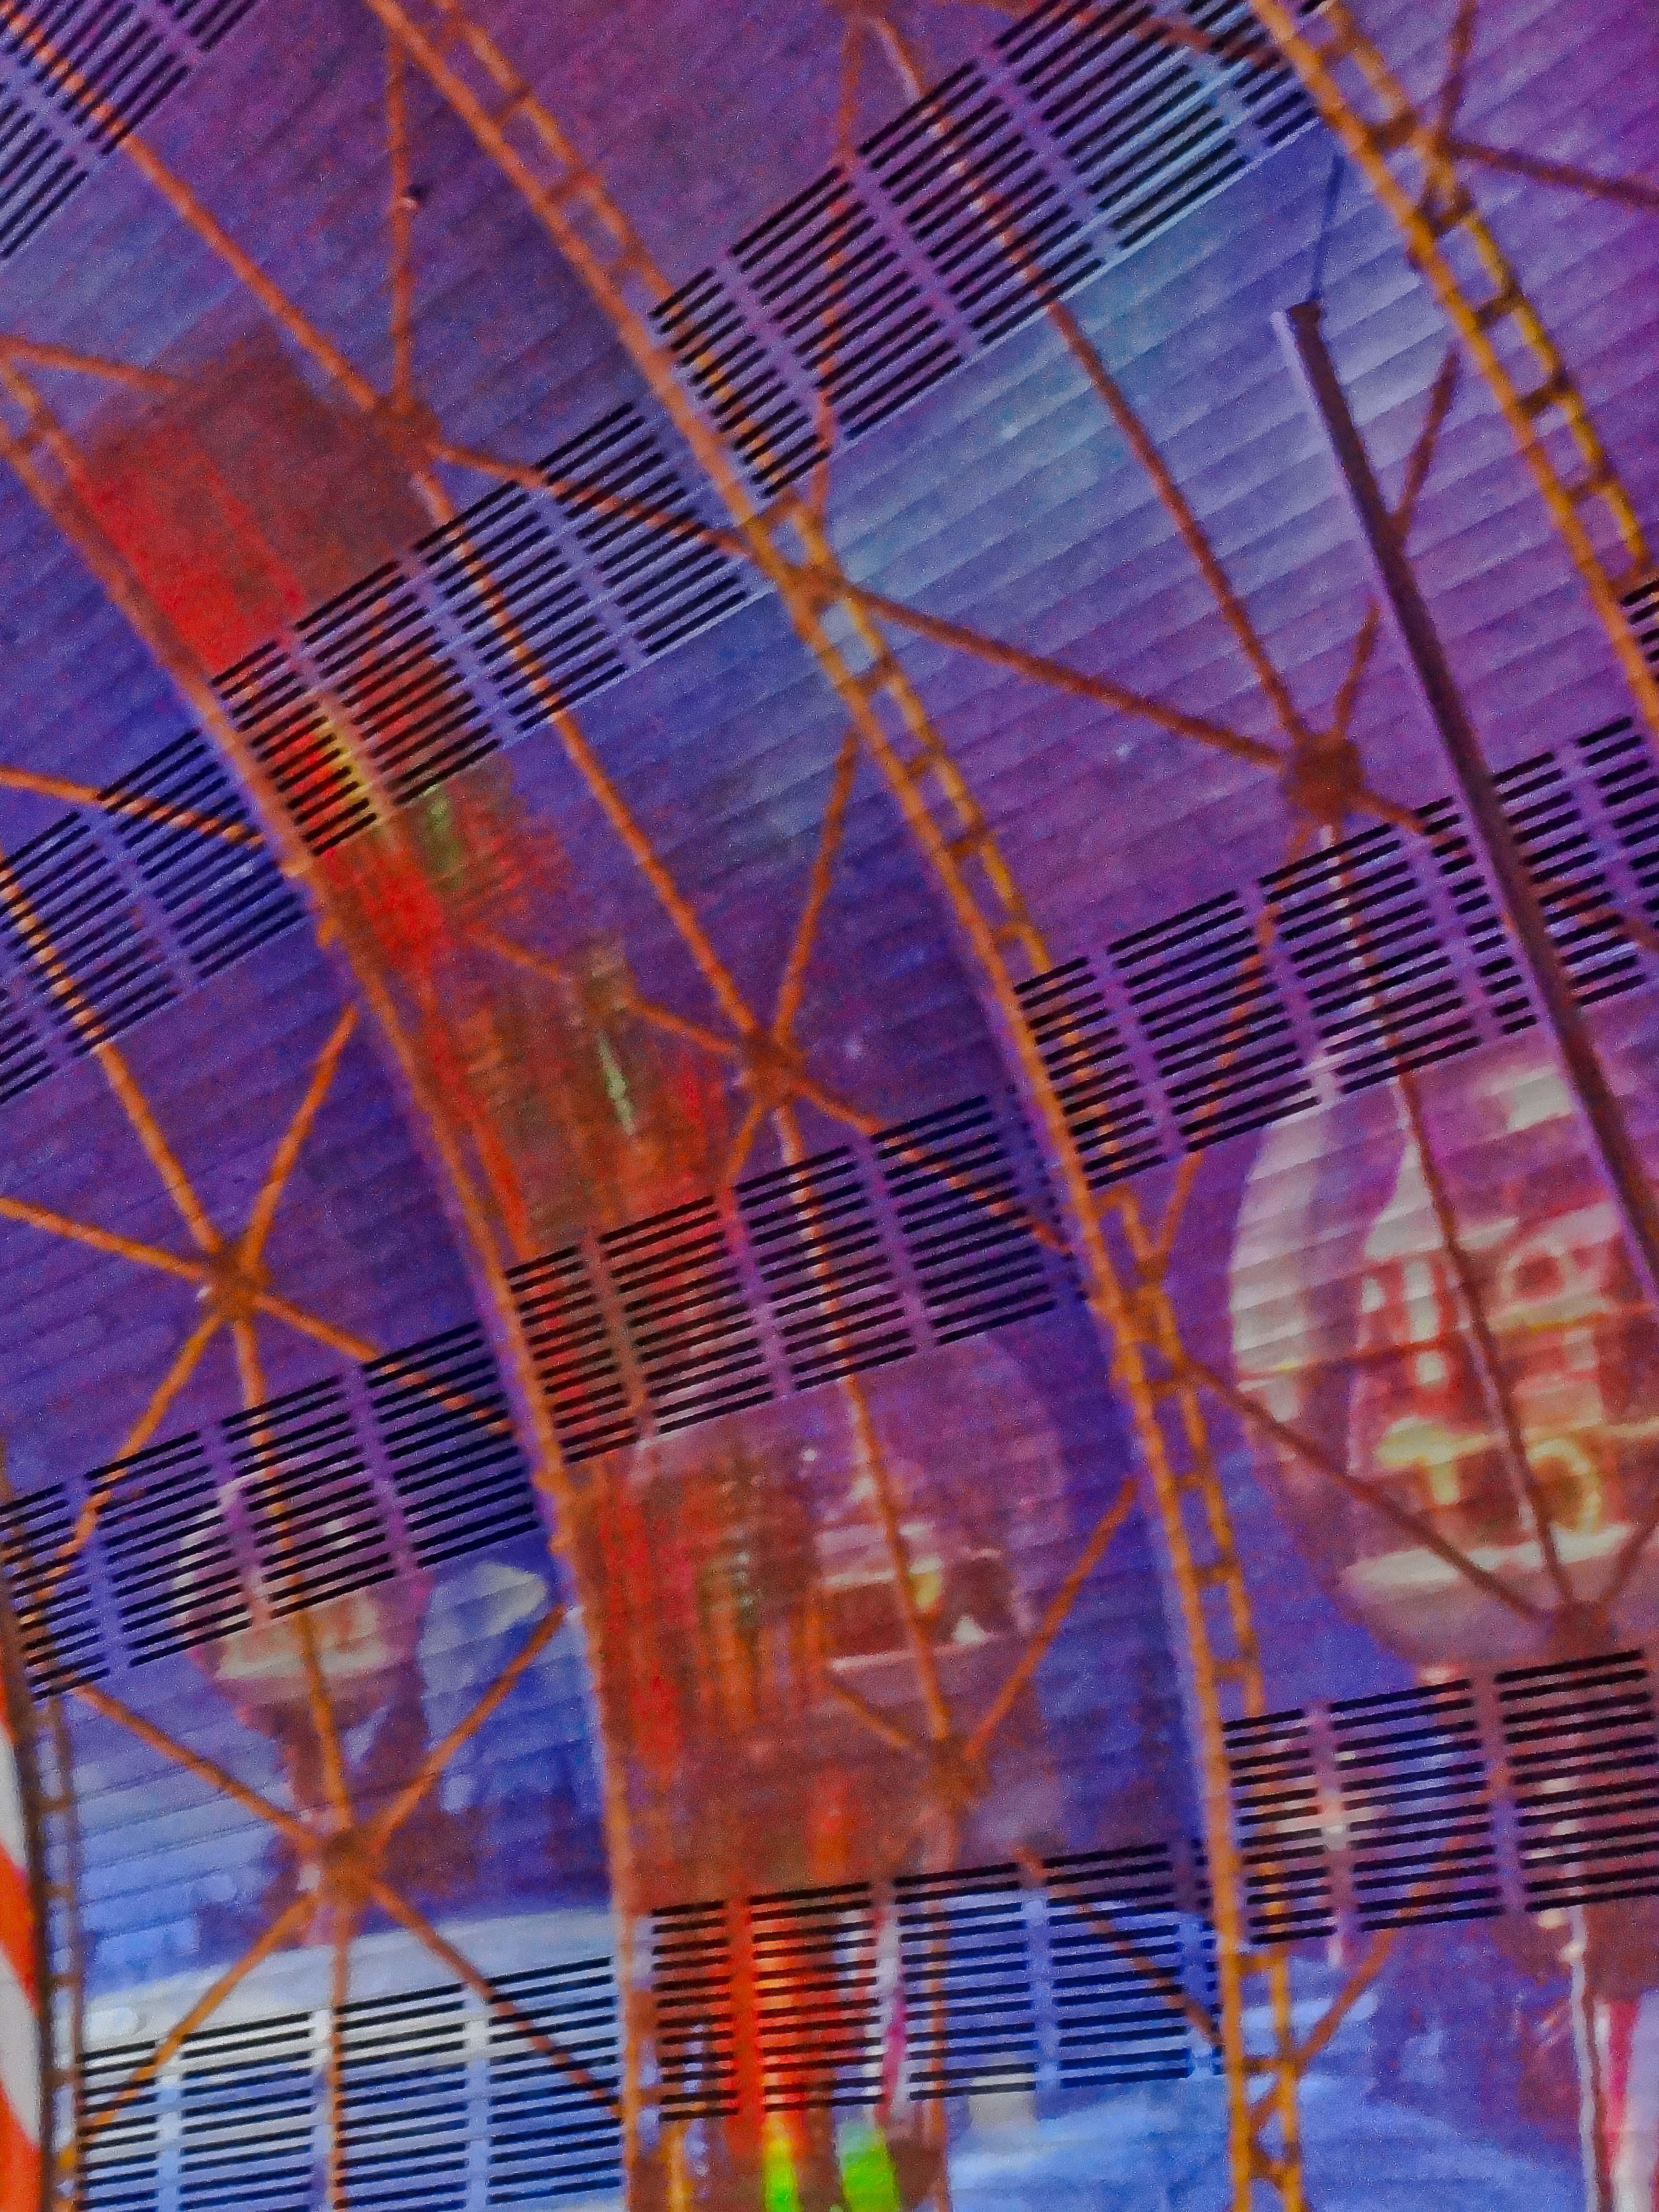 4050_Radio City Music Hall Rockettes show